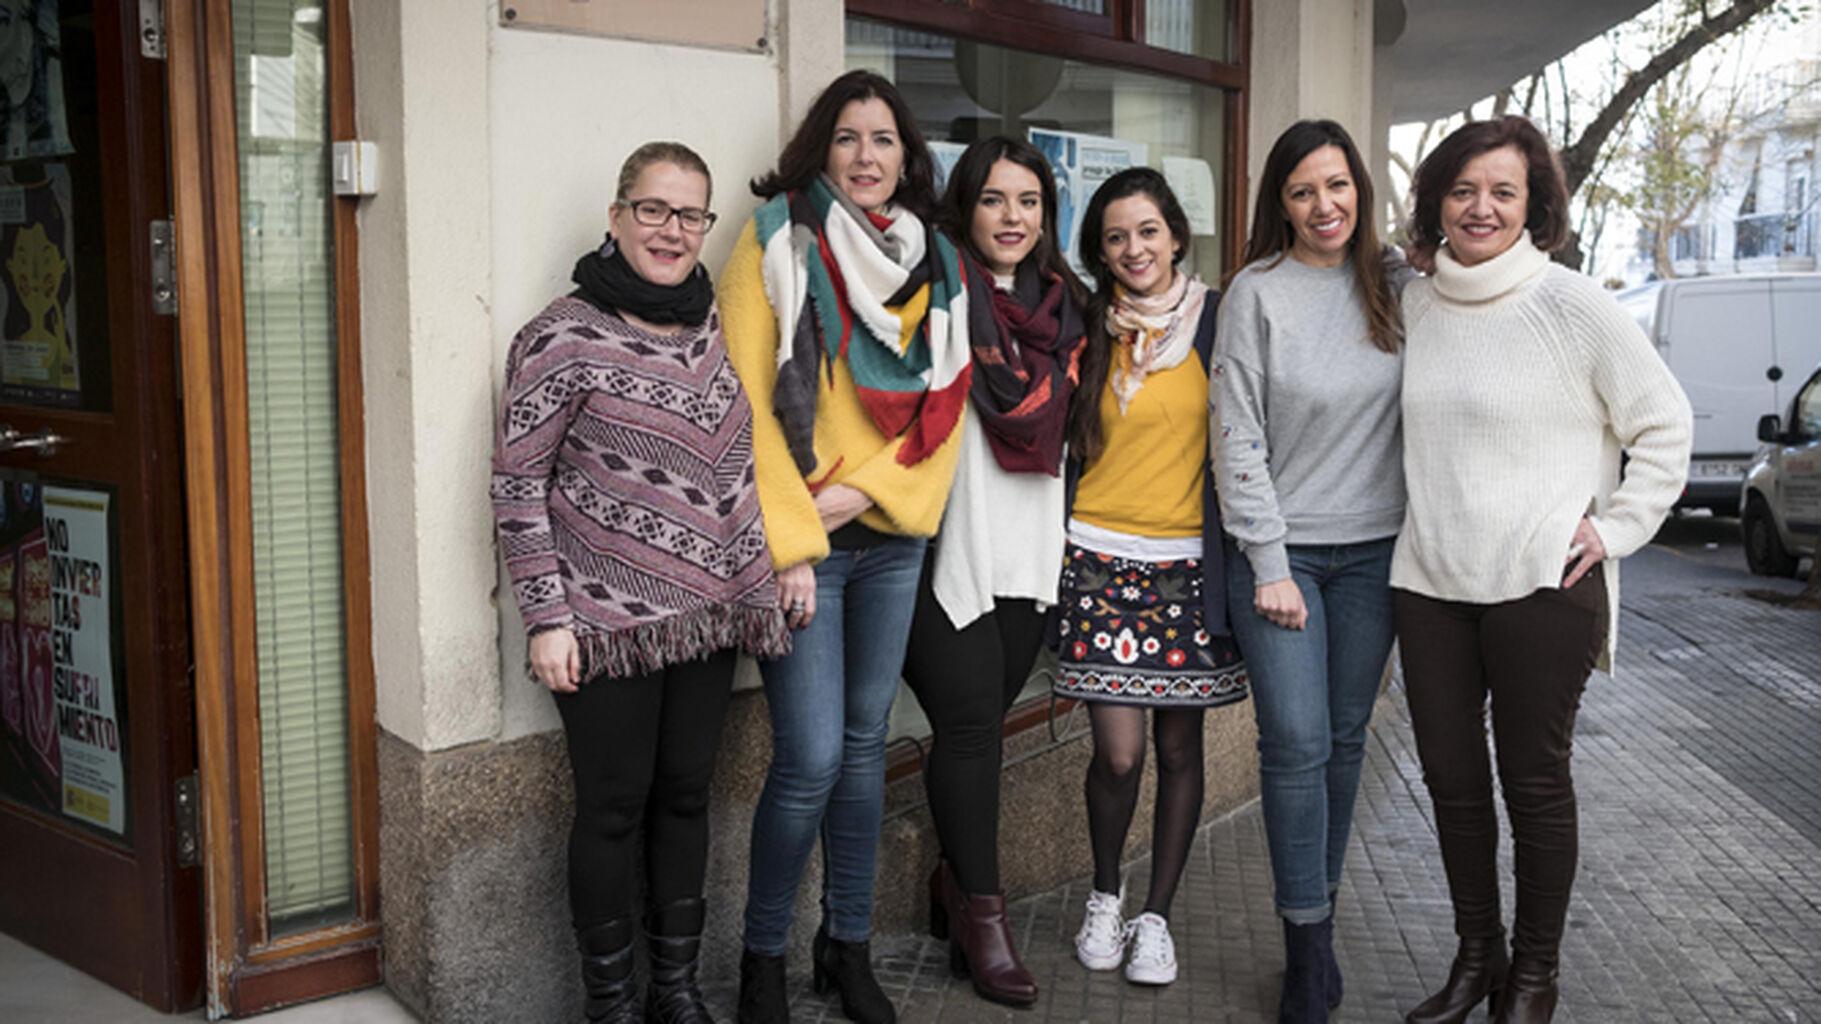 Contactos mujeres cadiz capital [PUNIQRANDLINE-(au-dating-names.txt) 47